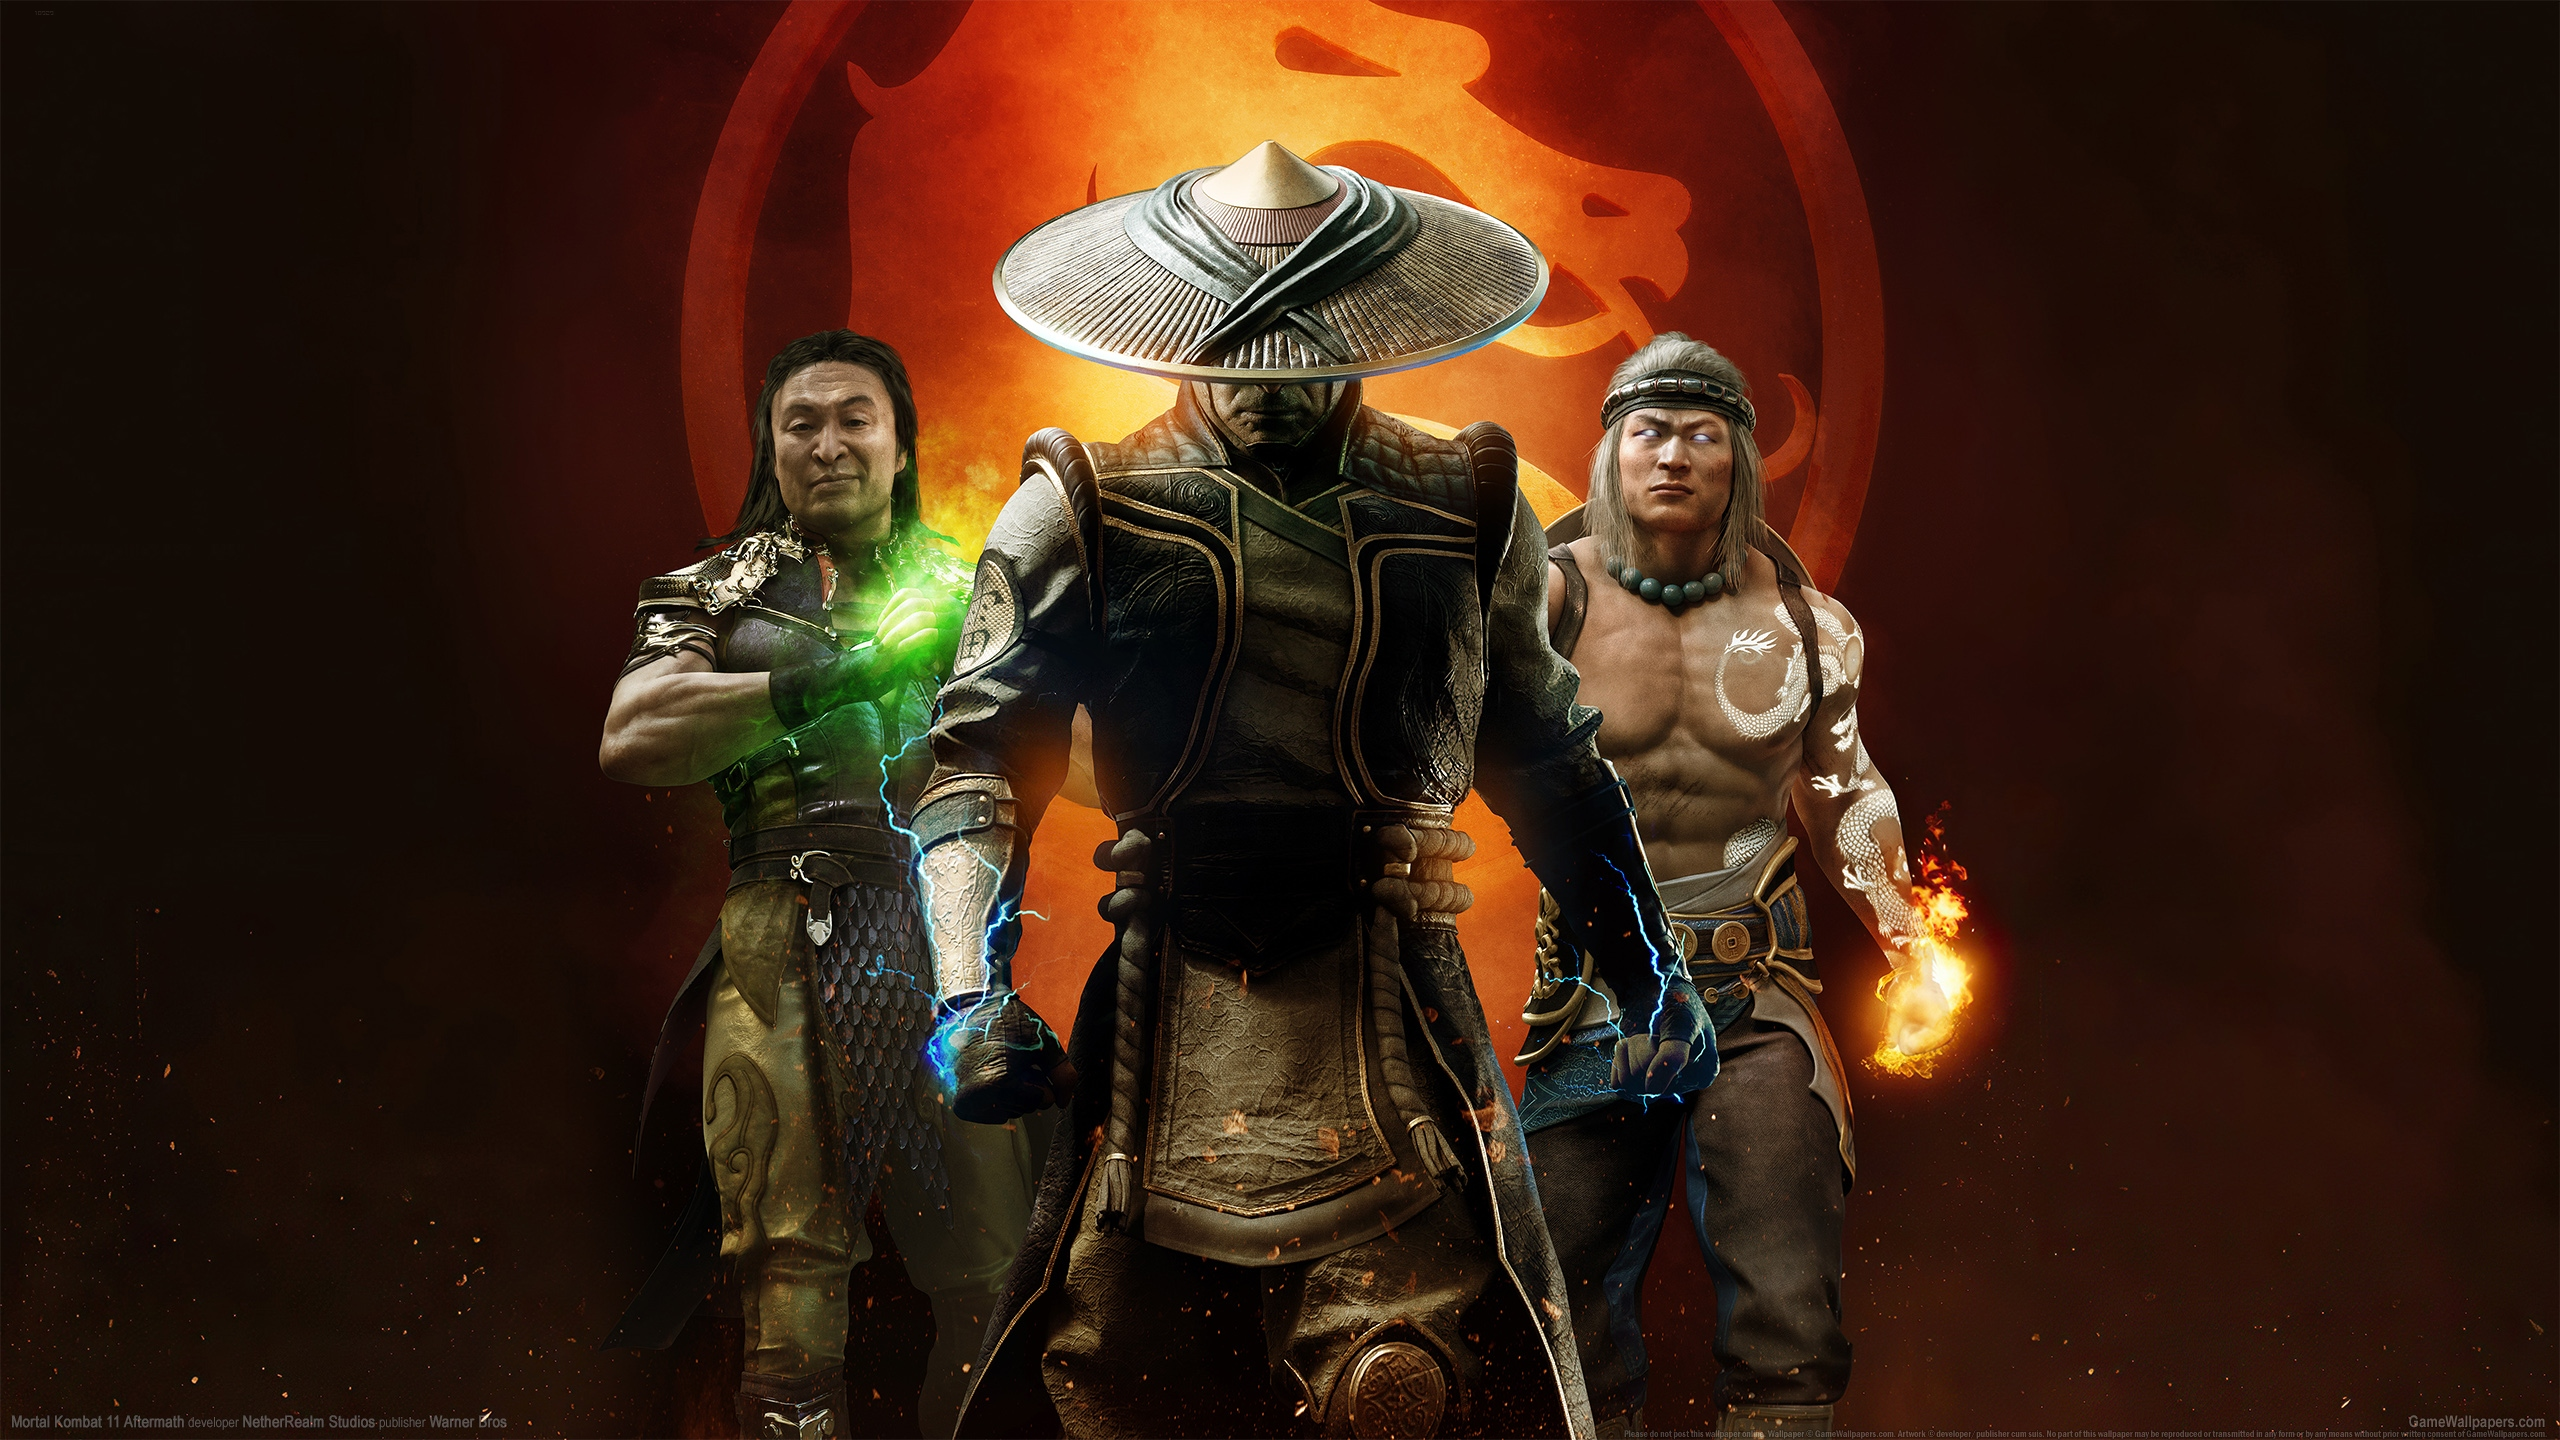 Mortal Kombat 11 Aftermath 2560x1440 wallpaper or background 01